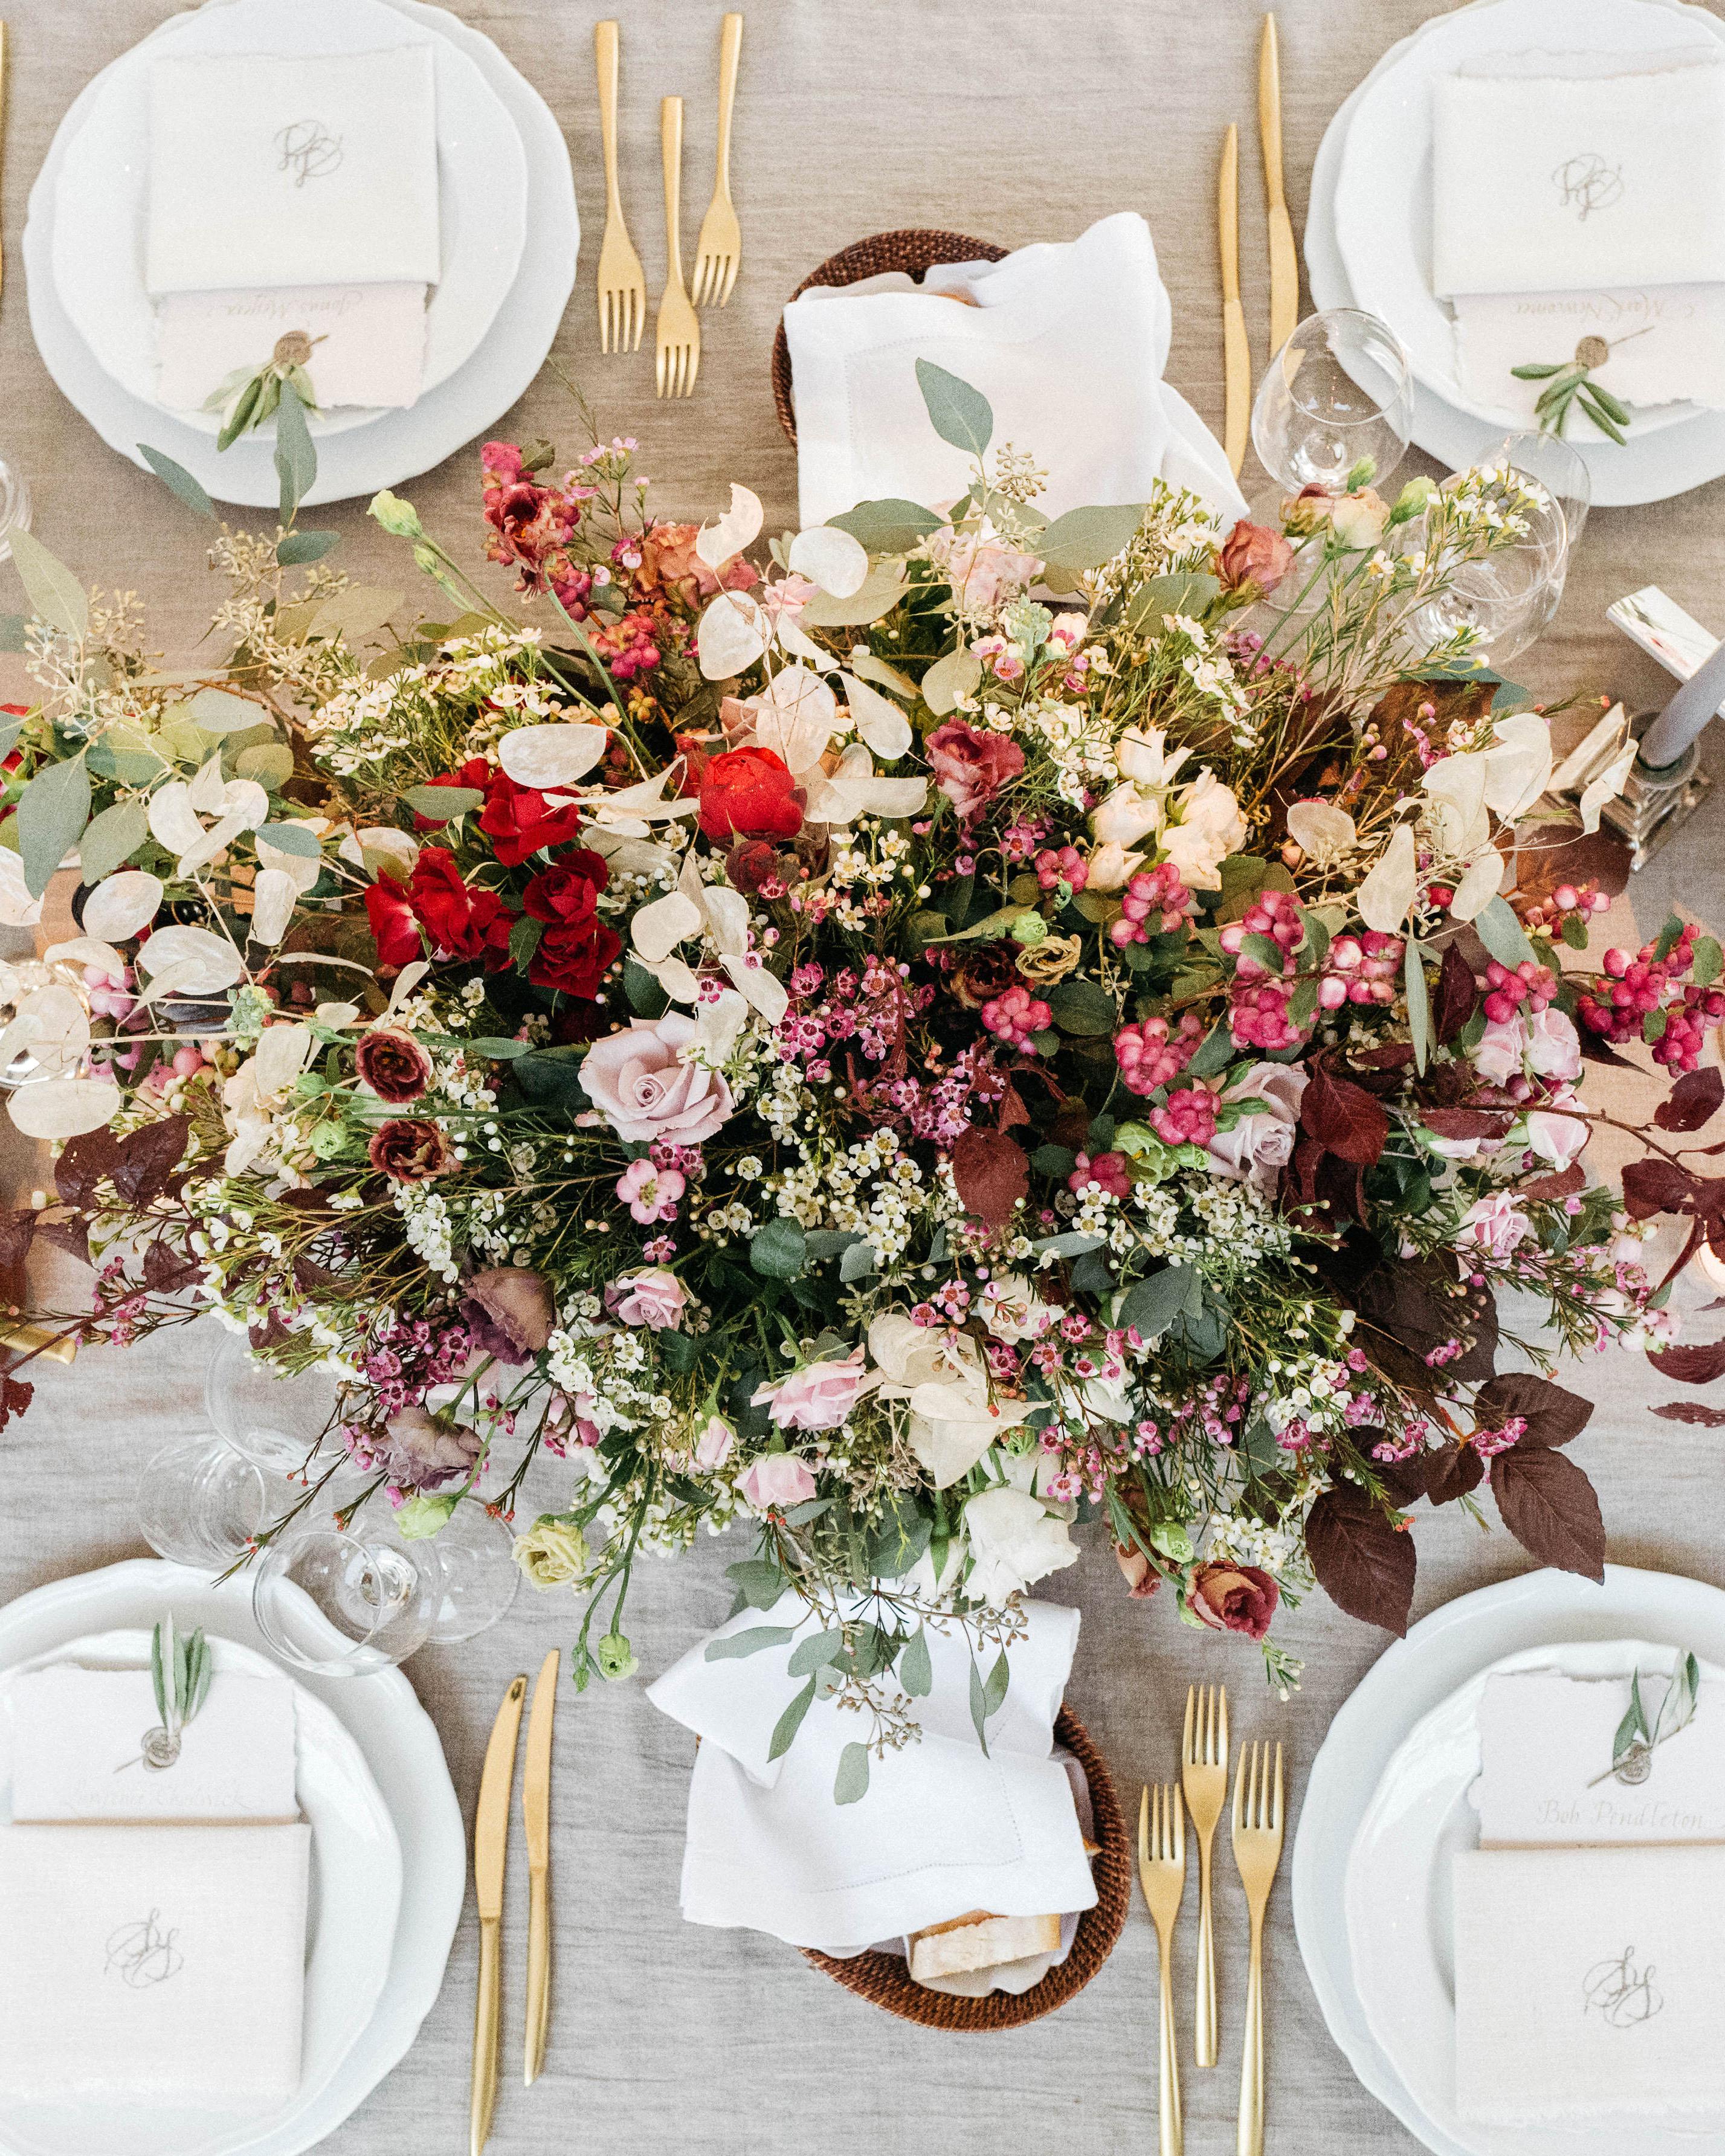 sara sam italy wedding table flower arrangement place setting